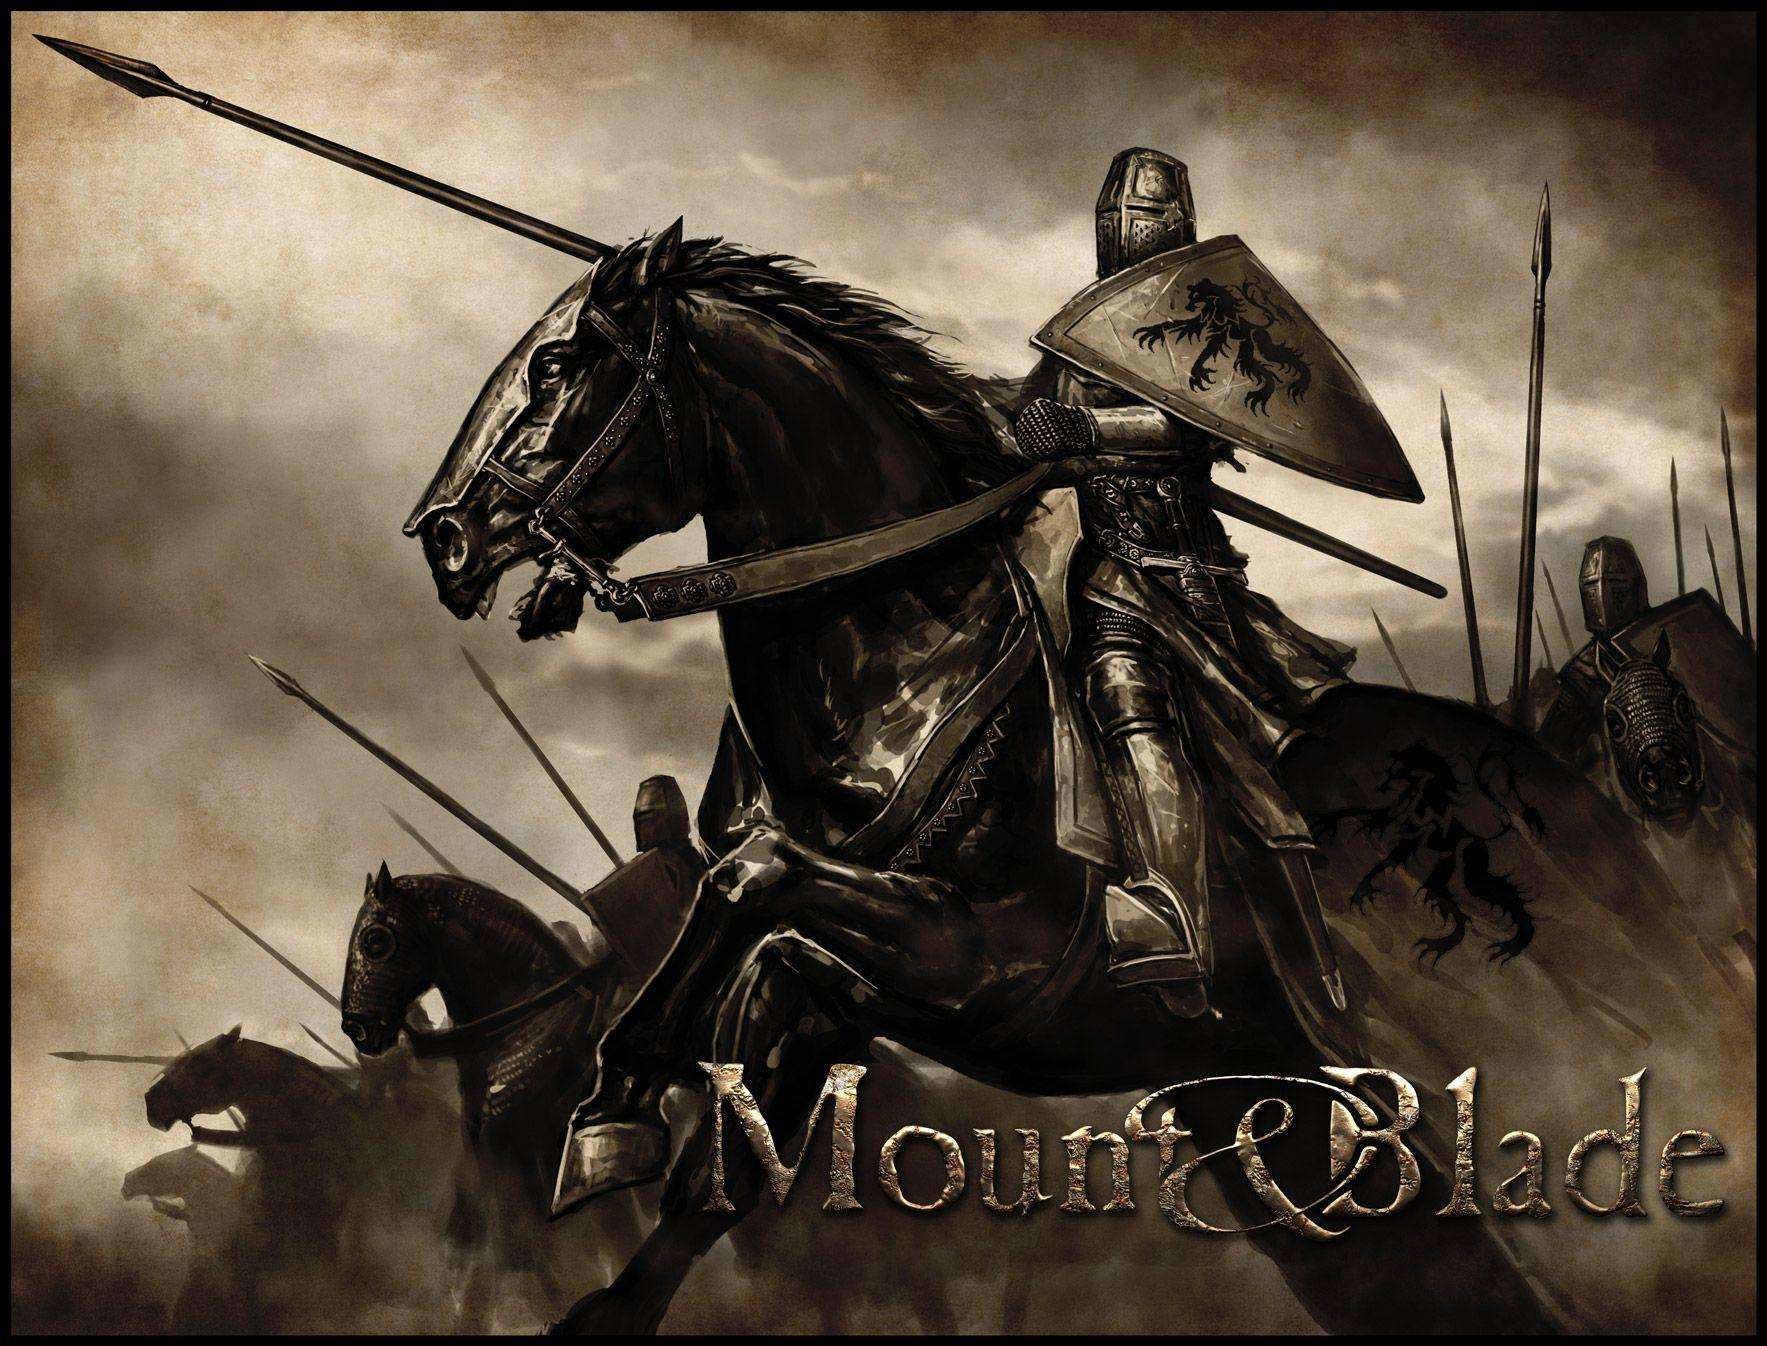 Good Wallpaper Horse Warrior - Mount%20and%20Blade%20Warband%201  2018_154624.jpg